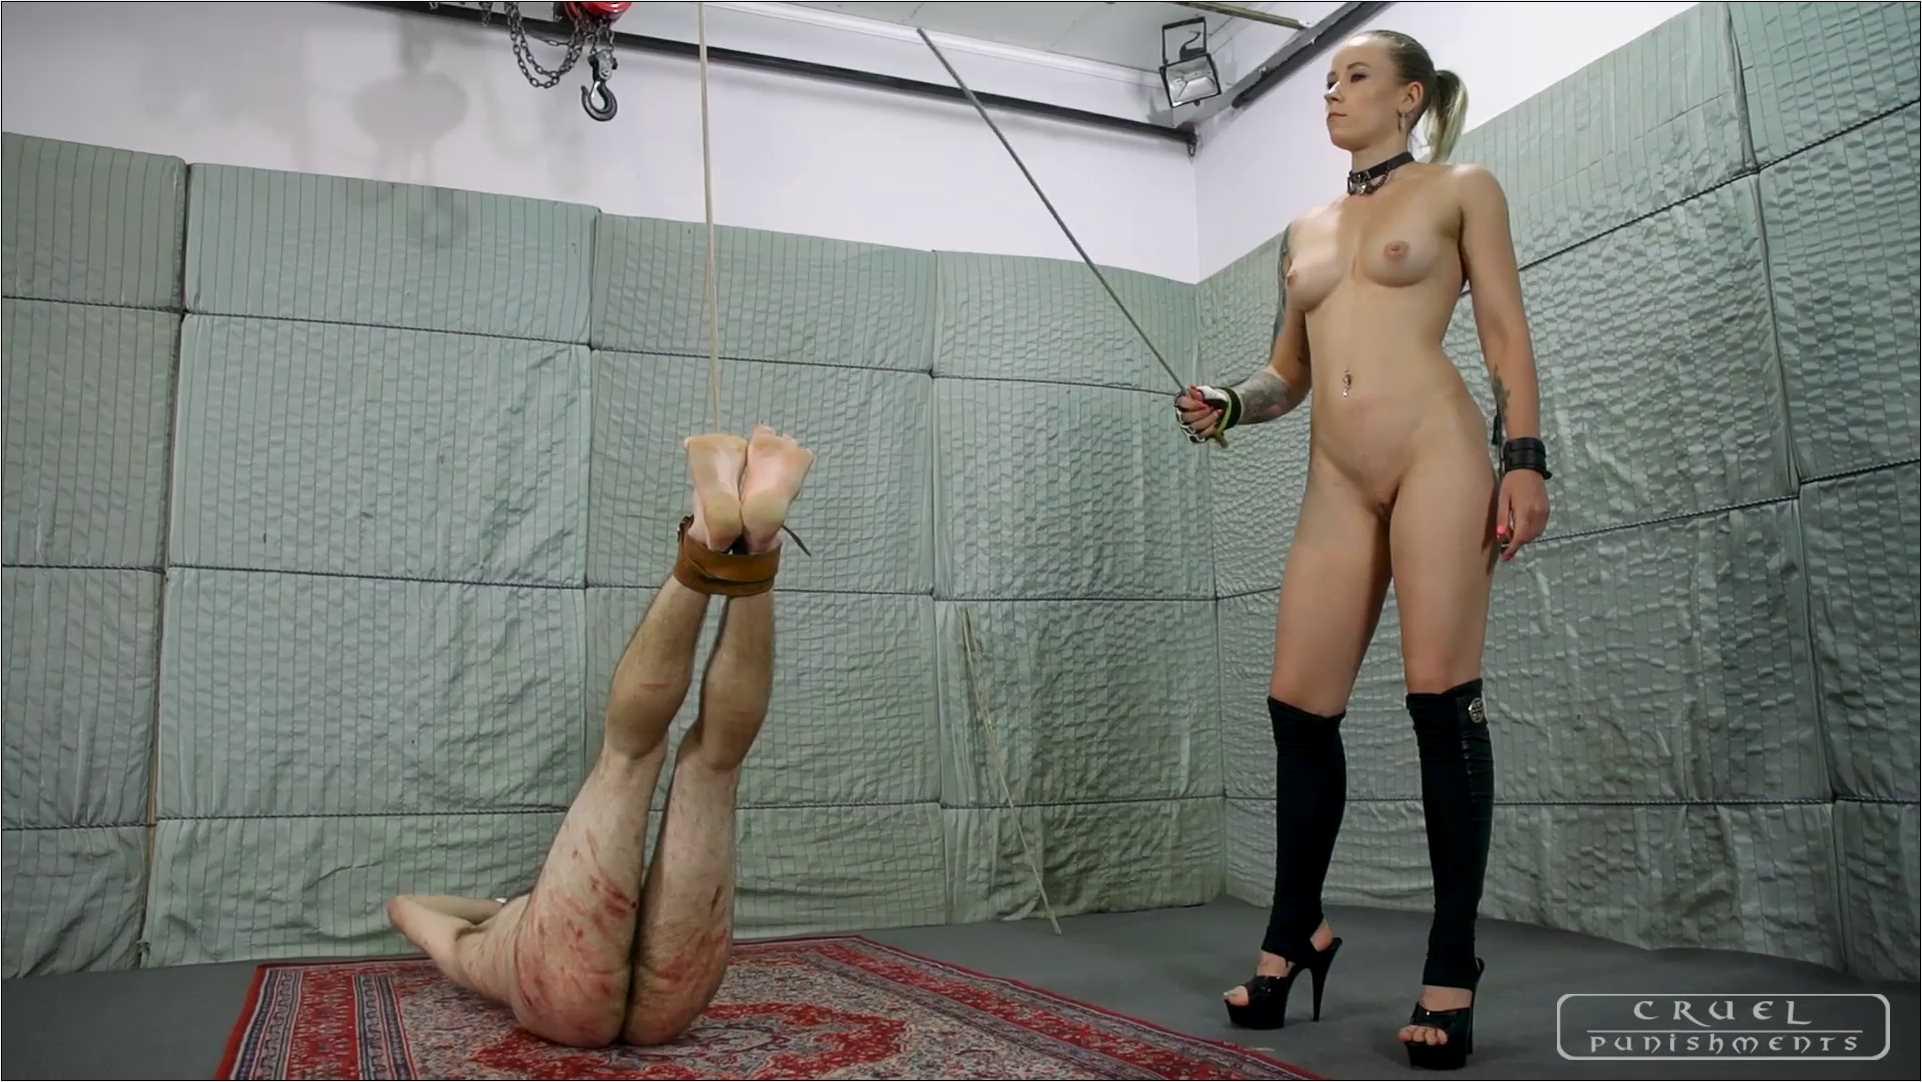 Mistress Anette In Scene: Cruel naked mistress Part 3 - CRUEL PUNISHMENTS - SEVERE FEMDOM - FULL HD/1080p/MP4